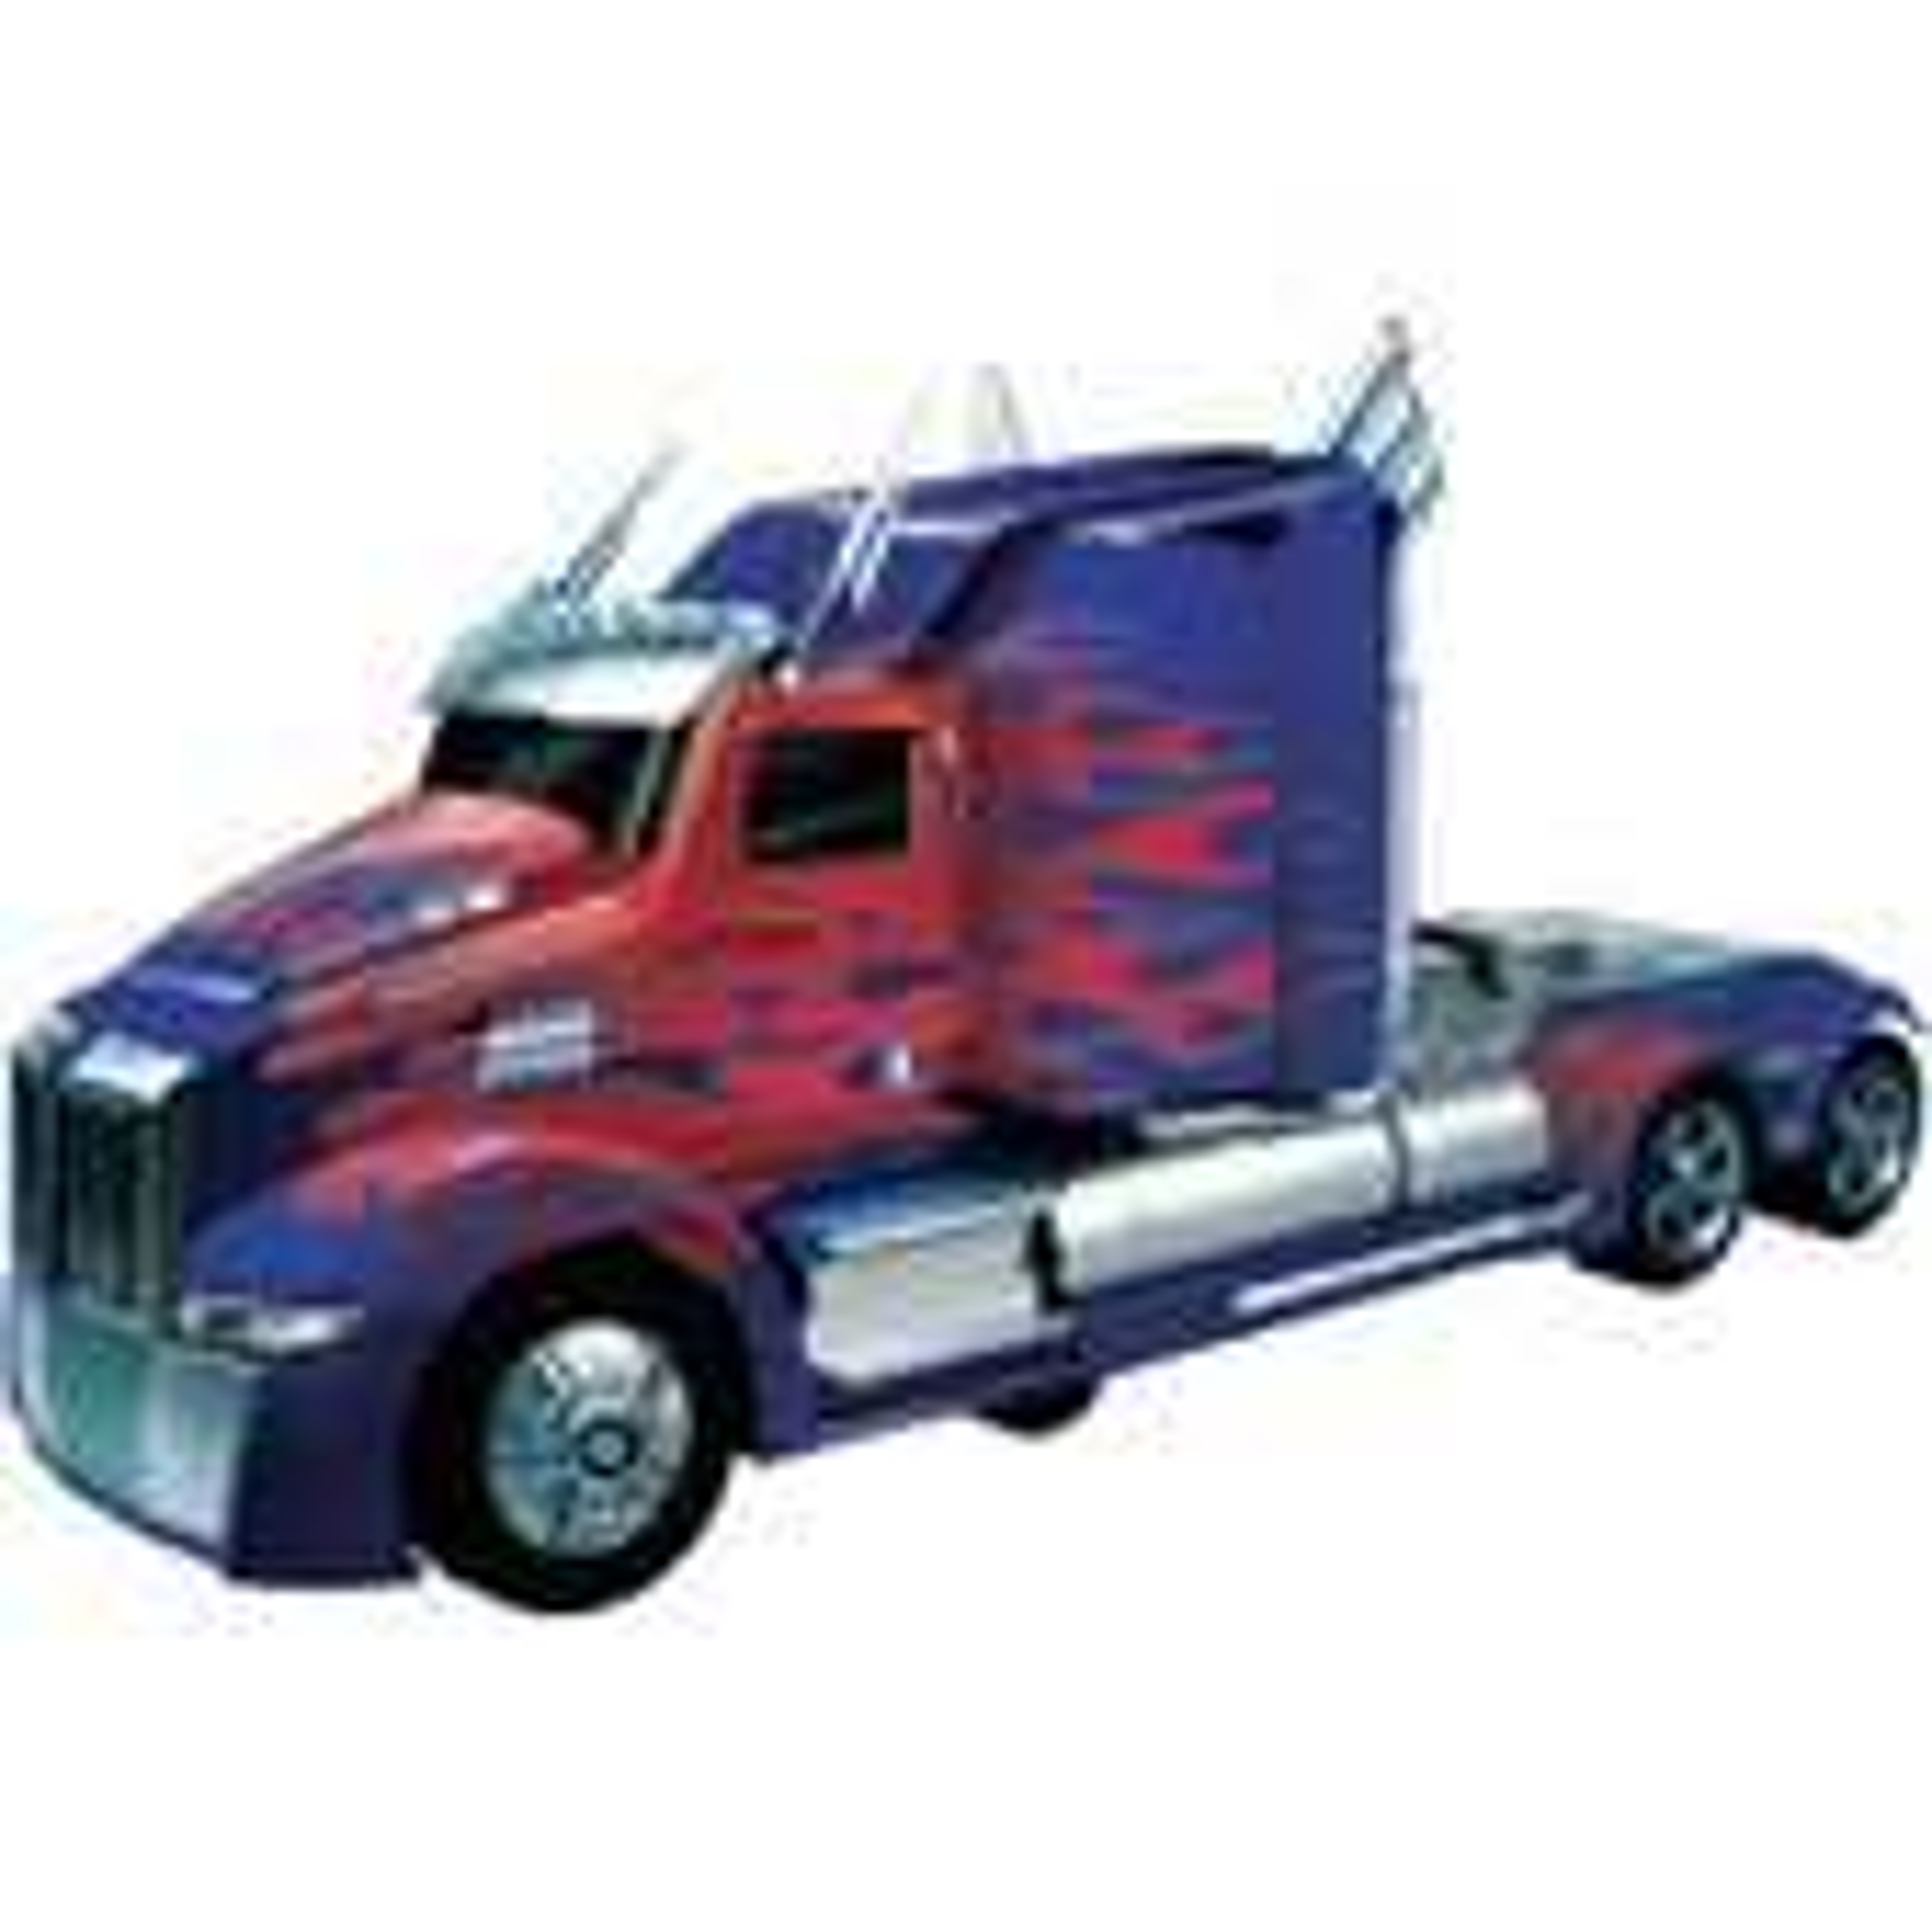 Nikko V�hicule �lectrique Transformers Autobot Optimus Prime Rtr (35128)